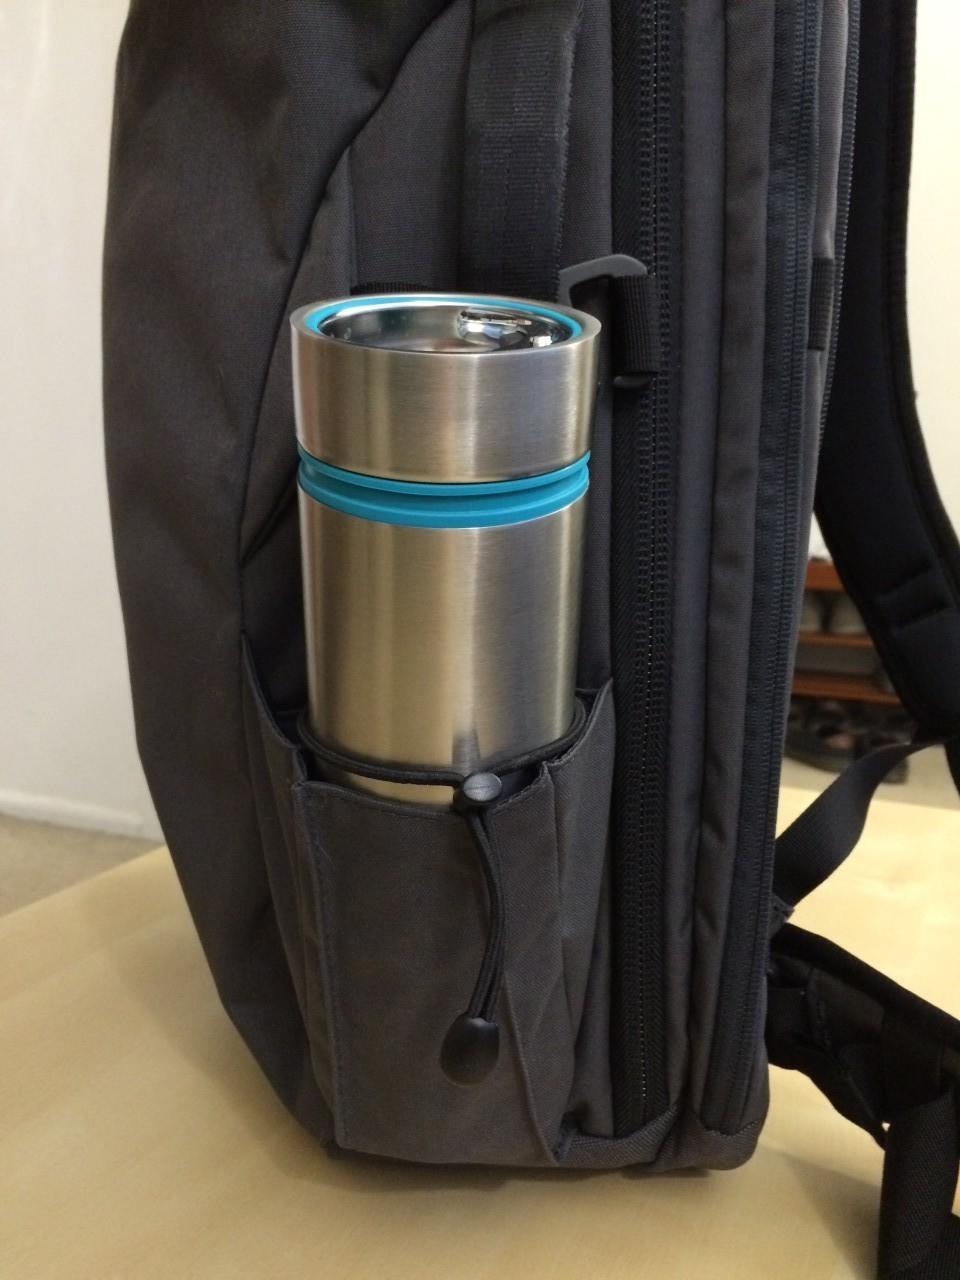 Minaal backpack water bottle pocket